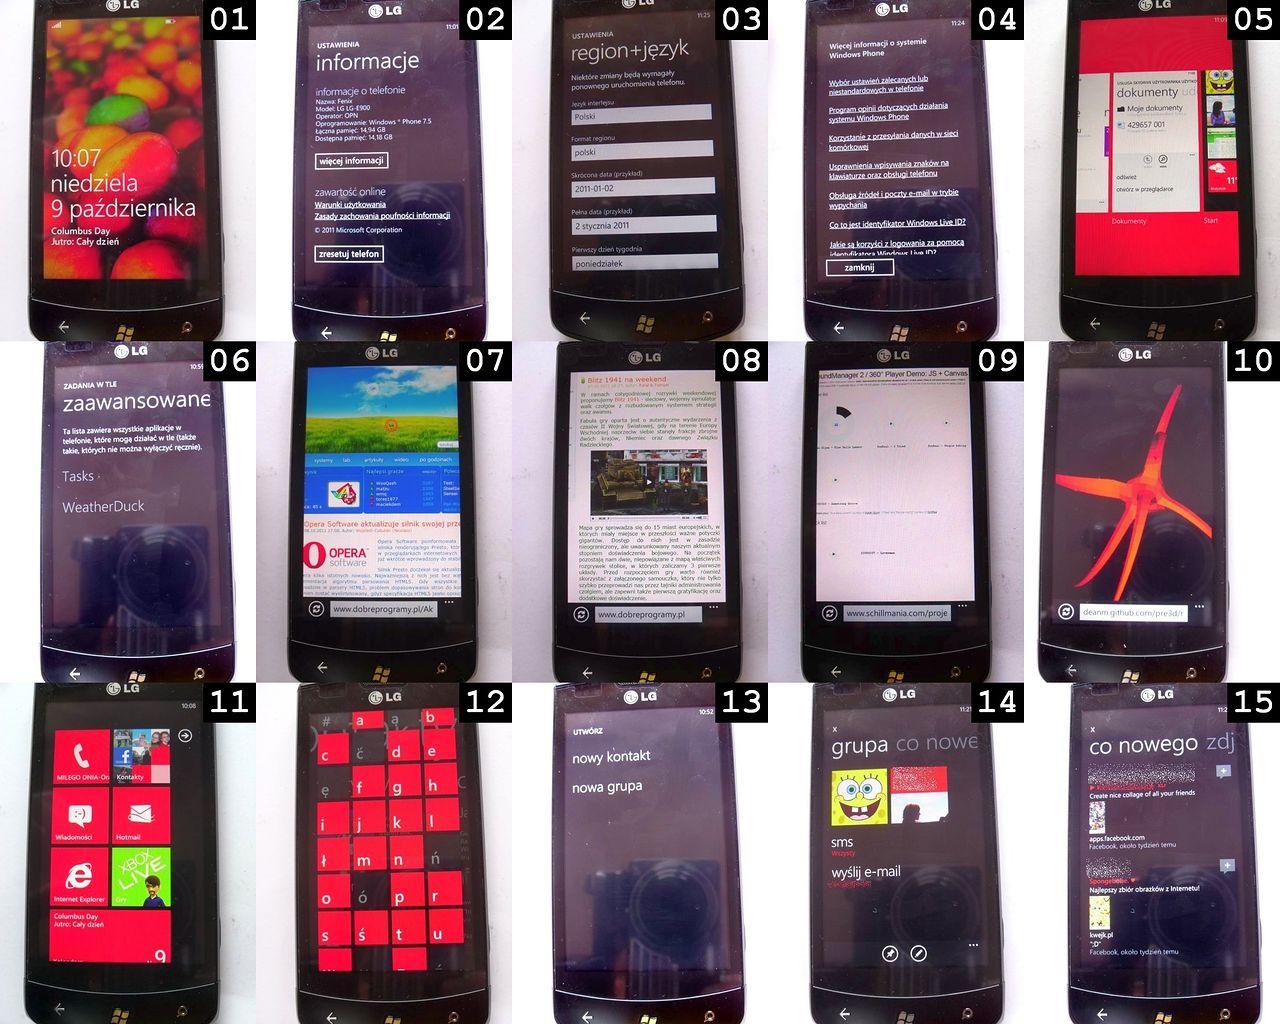 Windows Phone 7.5 Mango - (R)EWOLUCJA?